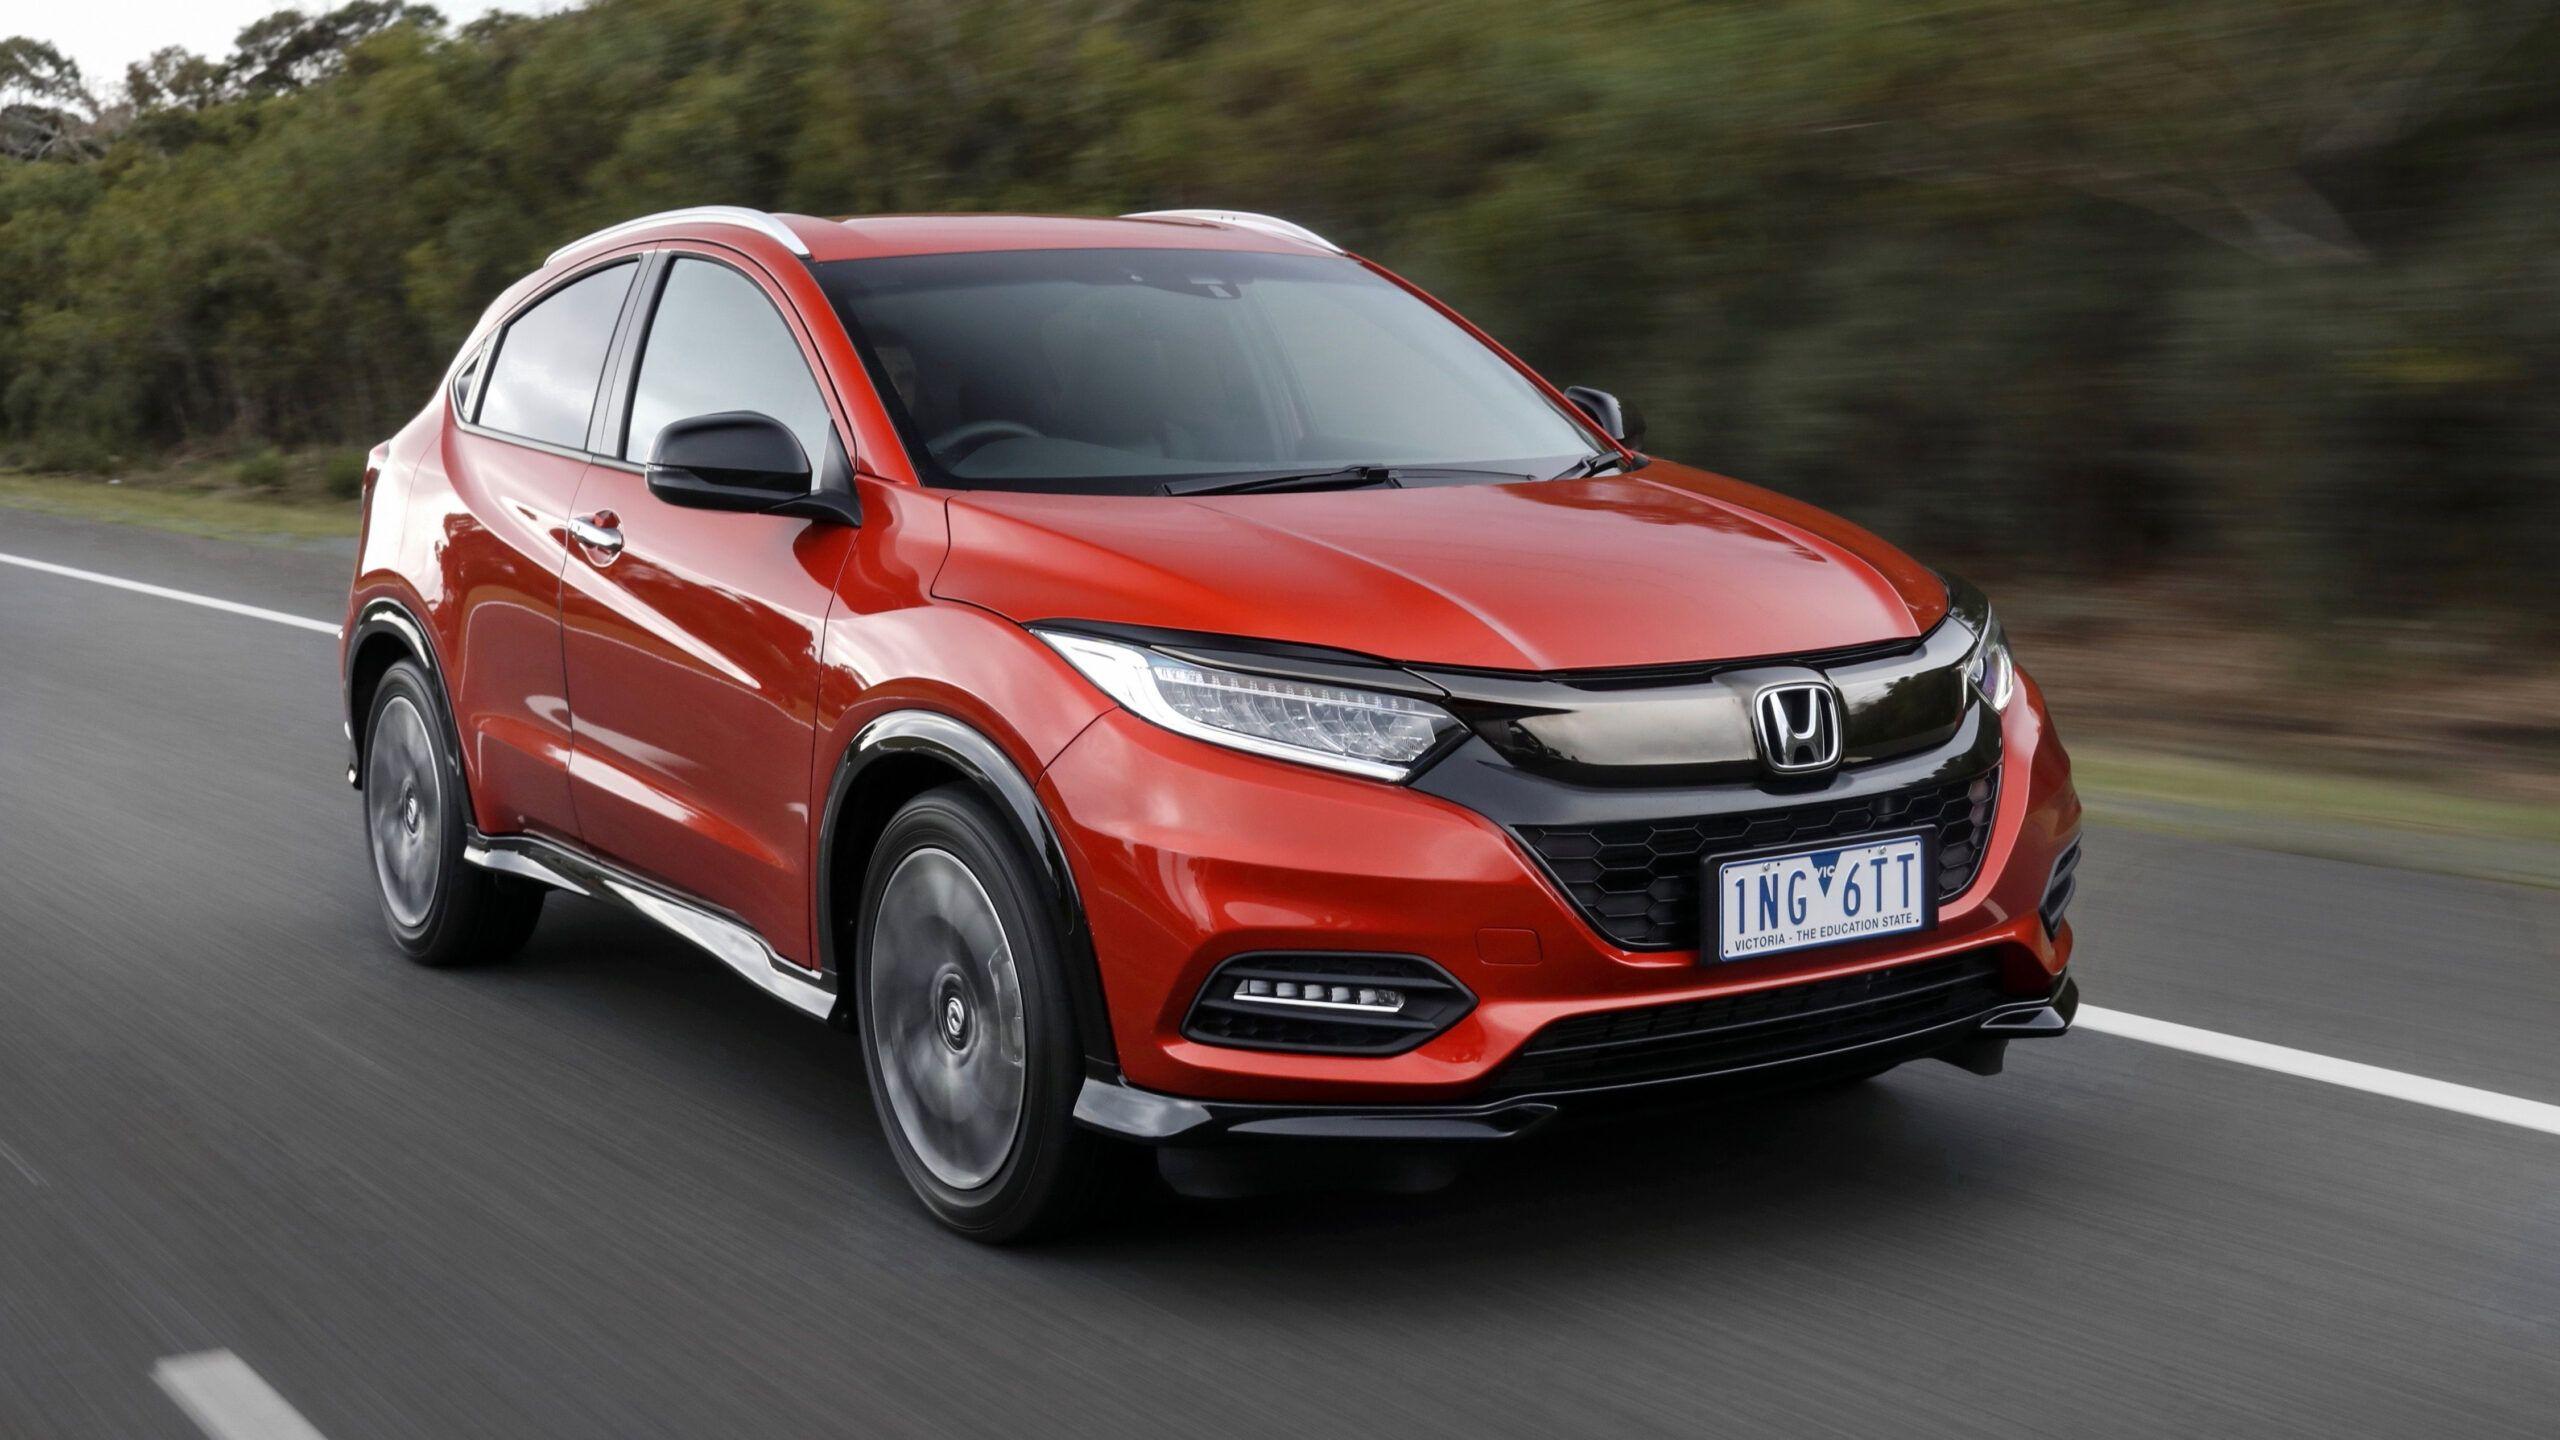 Honda Hrv 2021 Australia Idea And Evaluate In 2020 Honda Hrv Honda Hrv